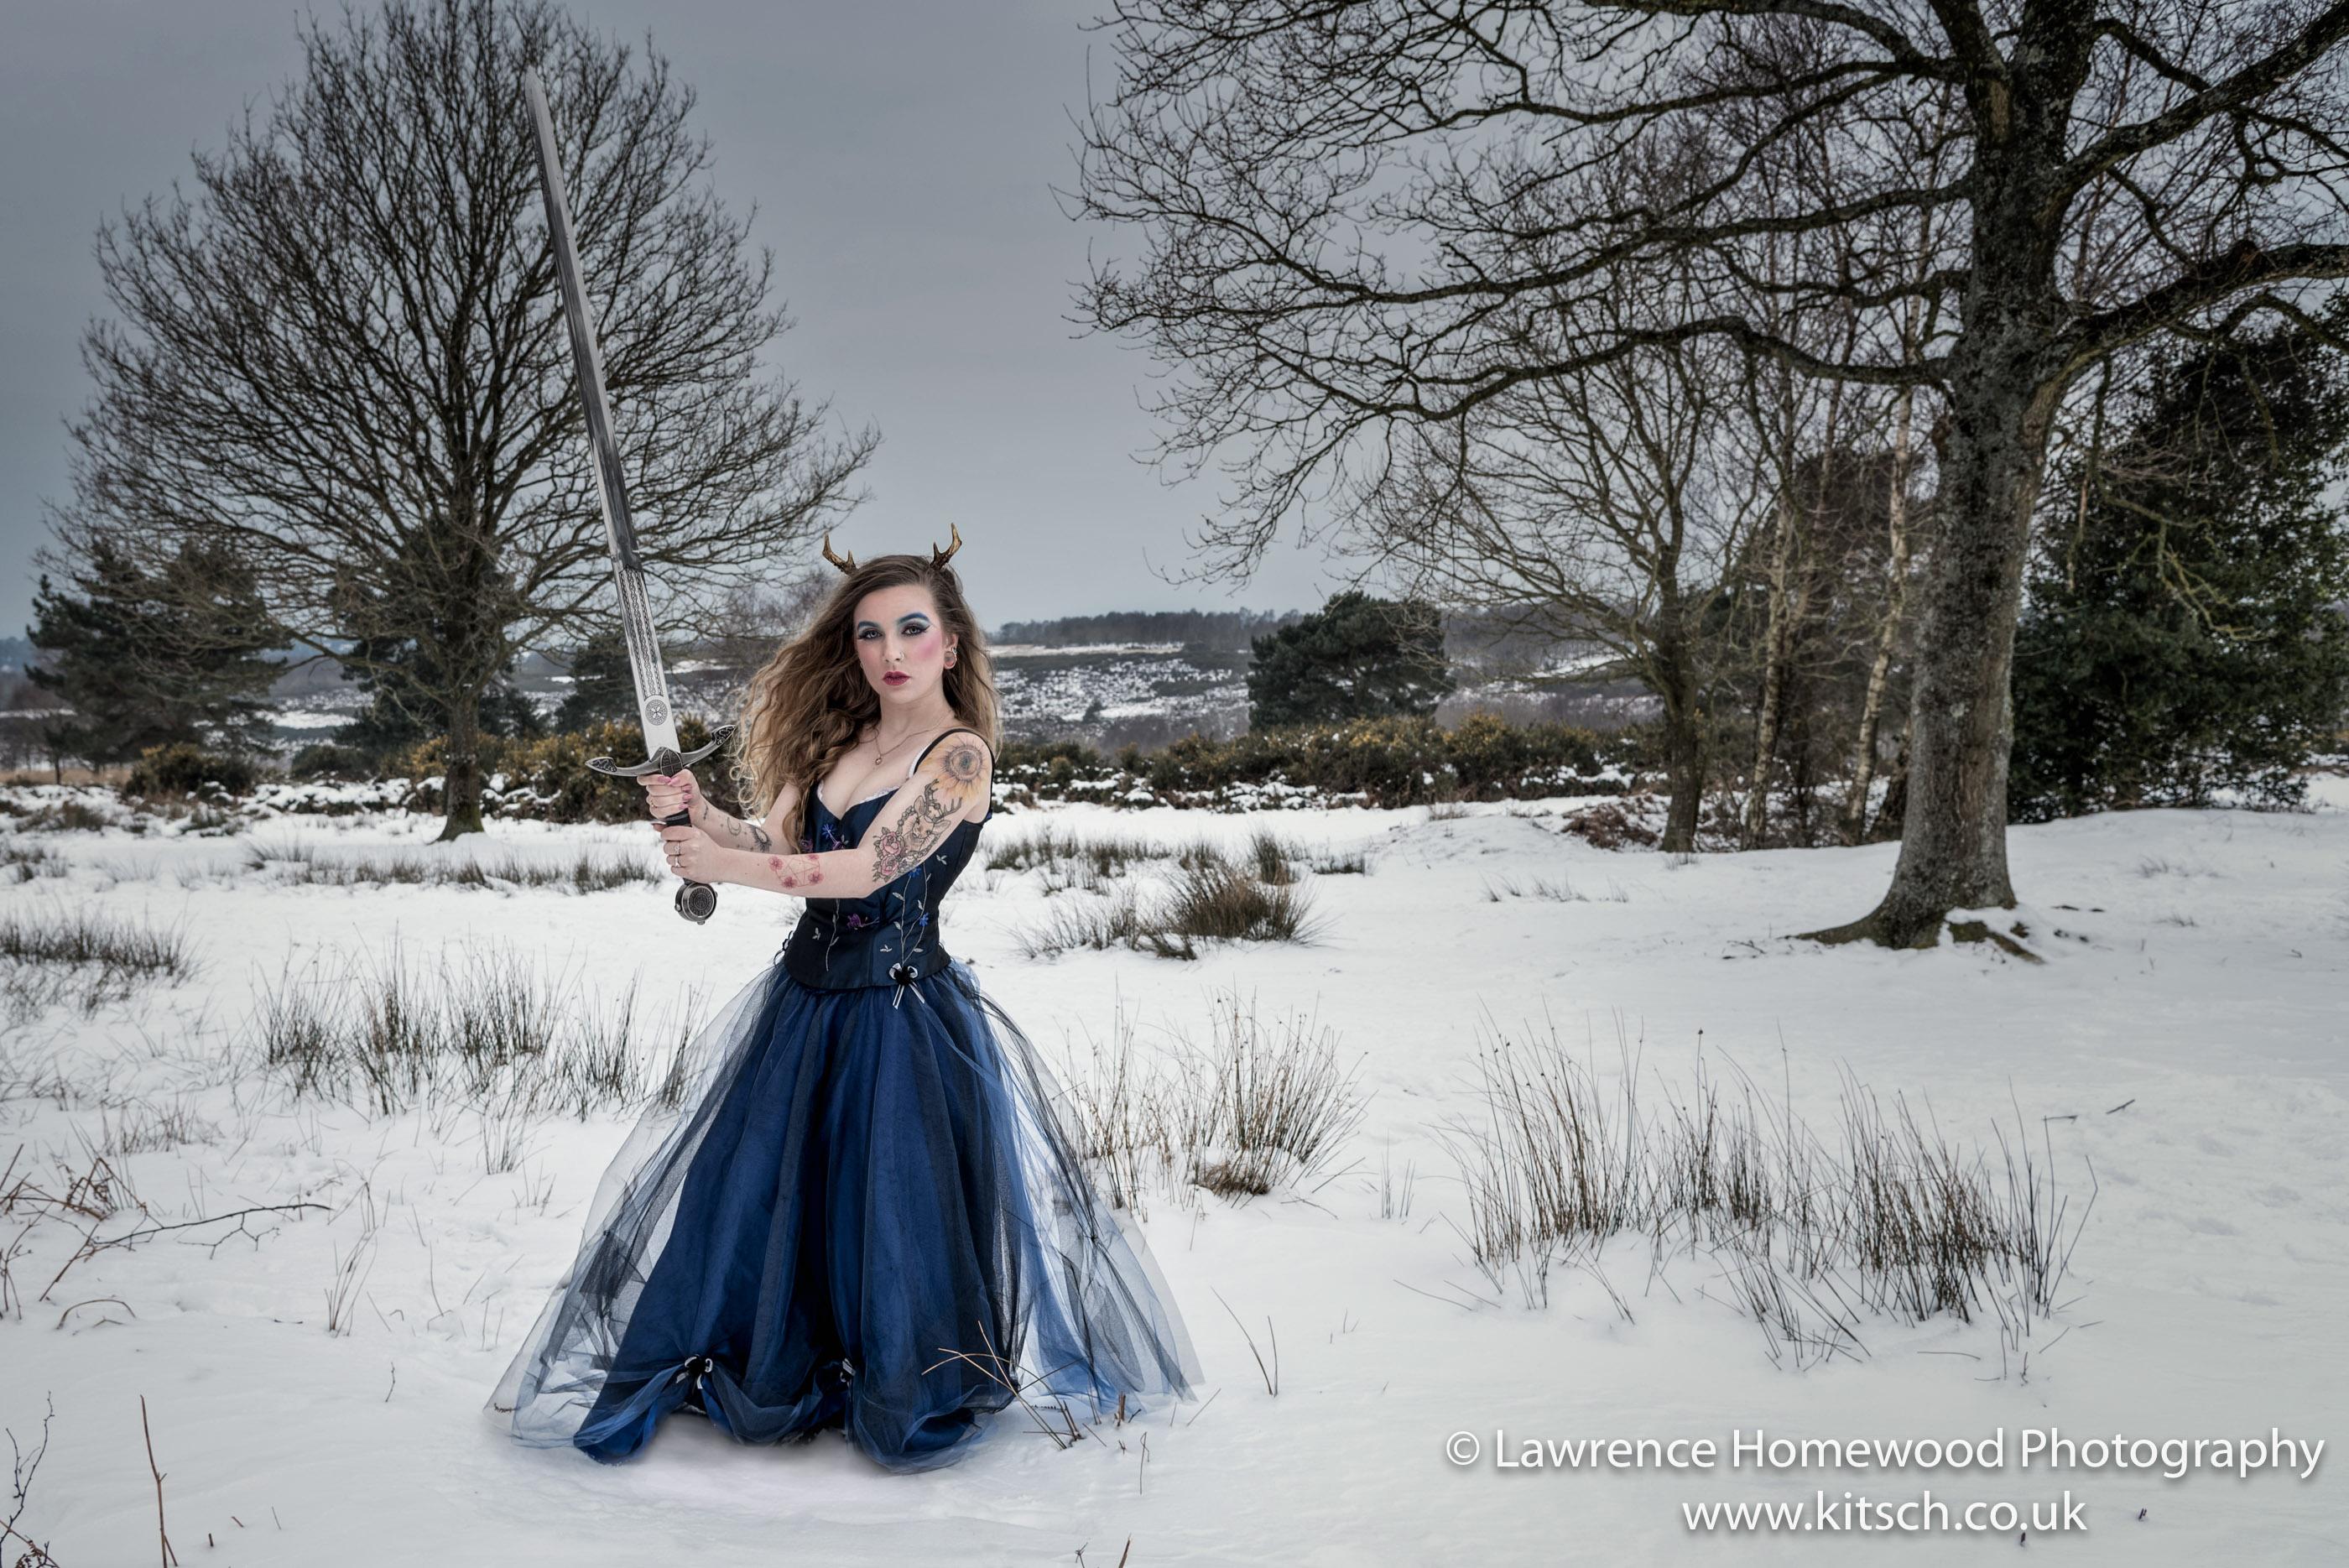 Fawn Princess - A Winters Tale28